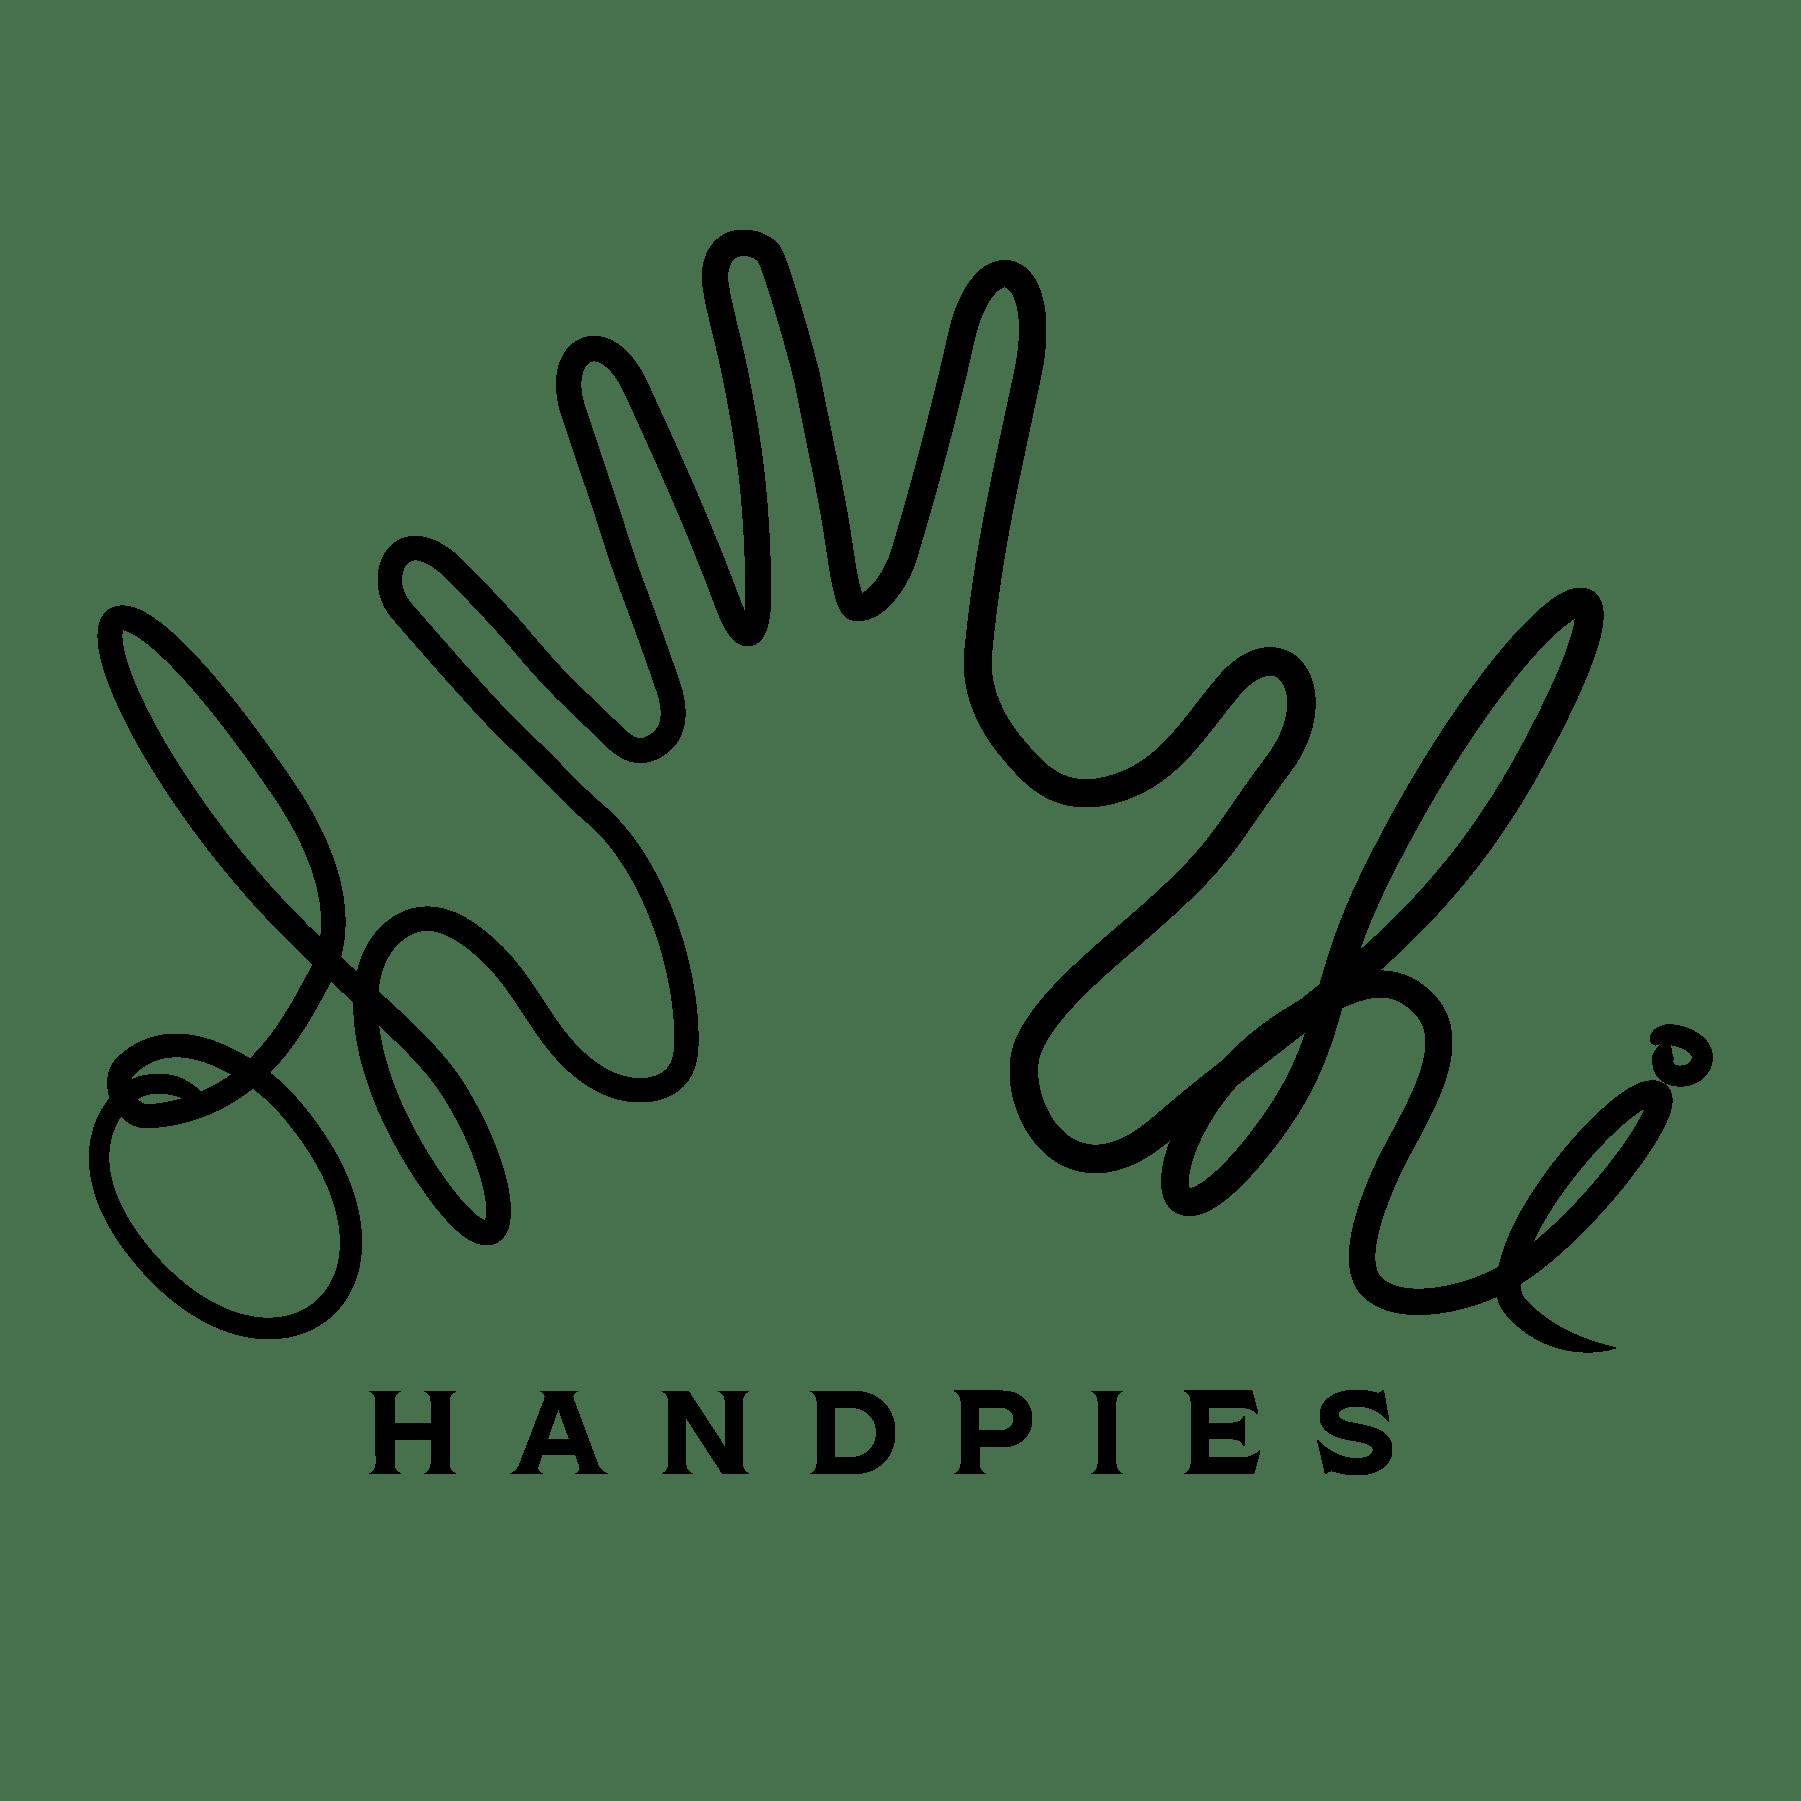 Oh Hi Handpies